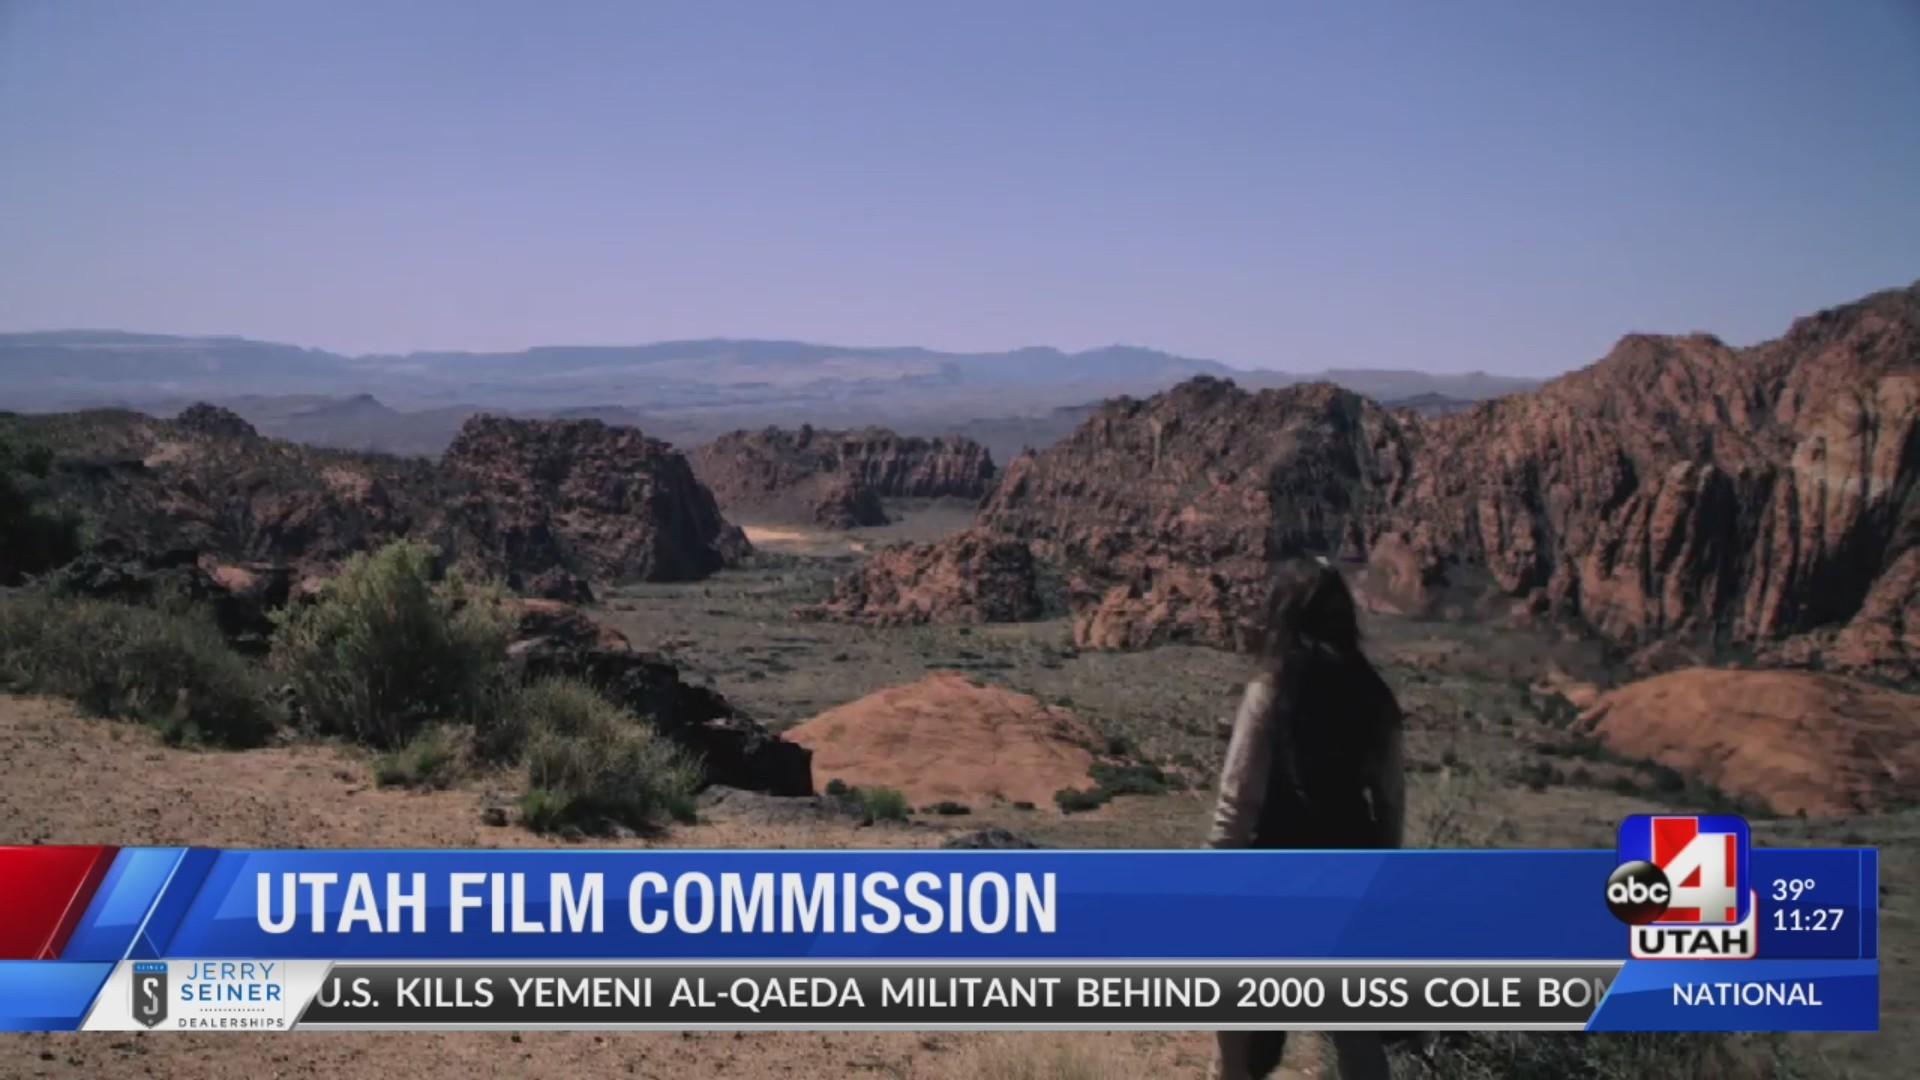 Utah_Film_Commission_1_20190107185808